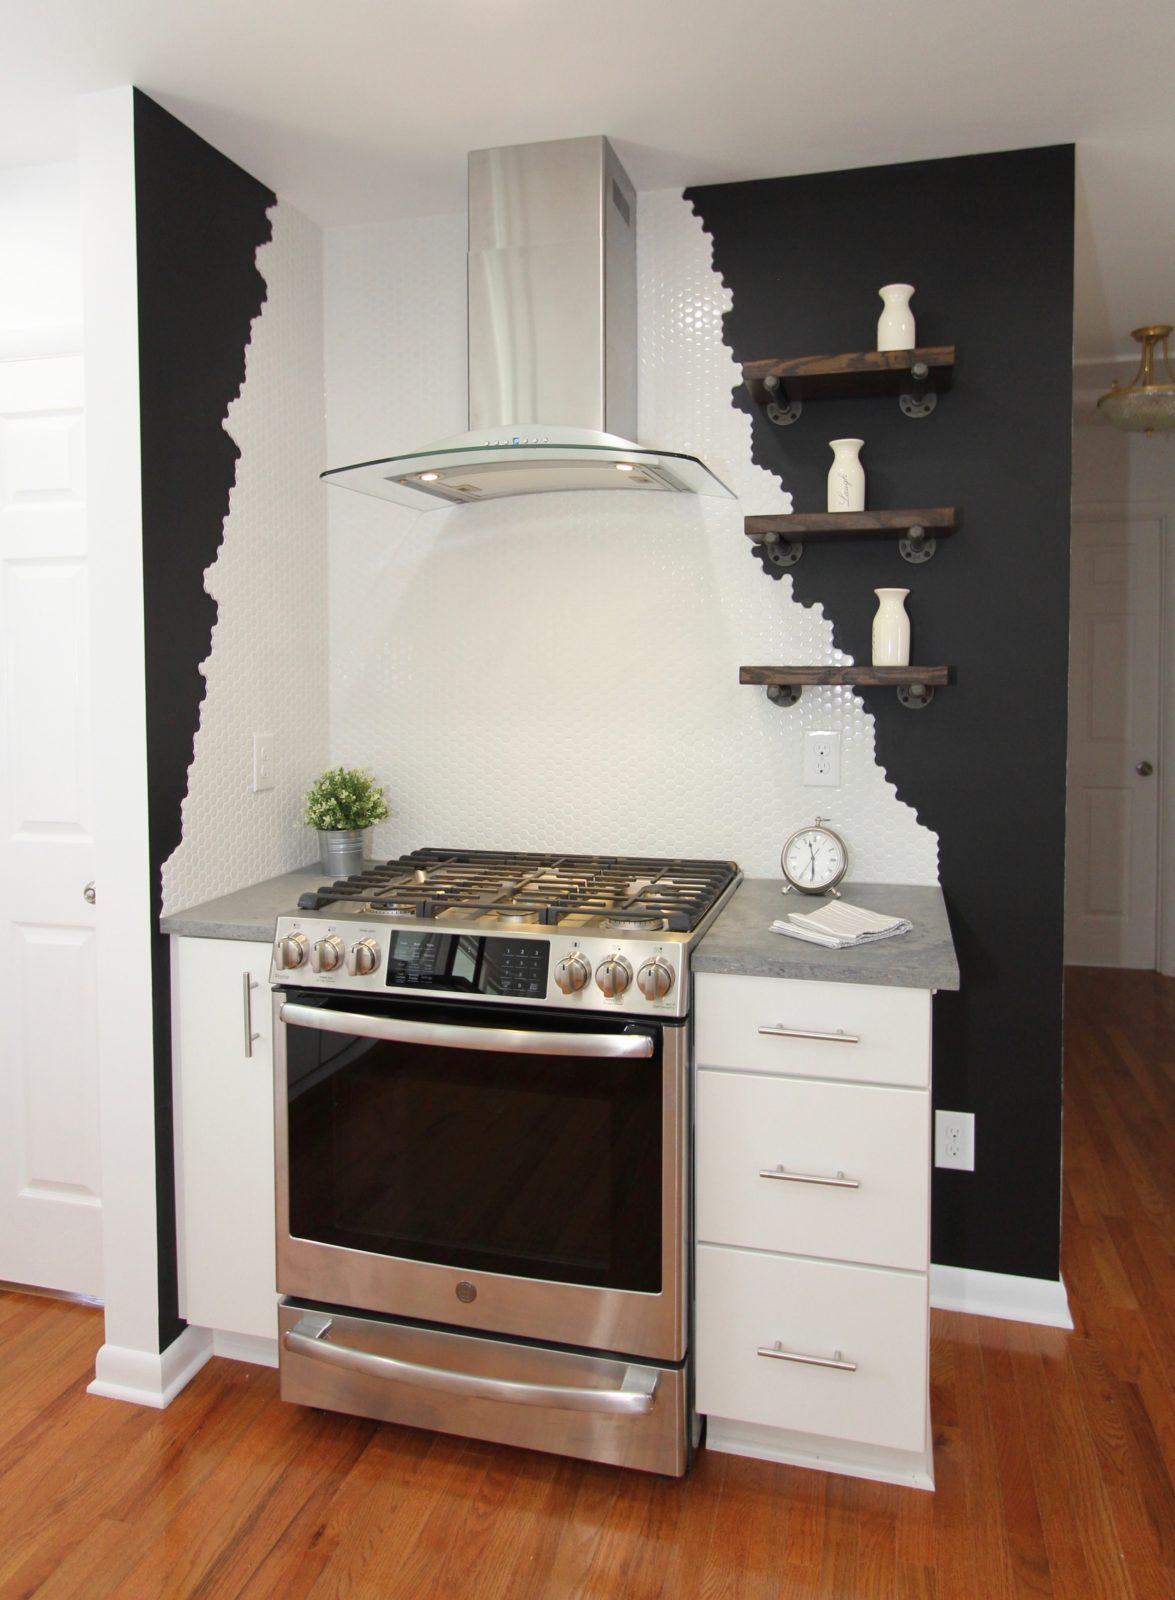 chalkboard-paint-kitchen